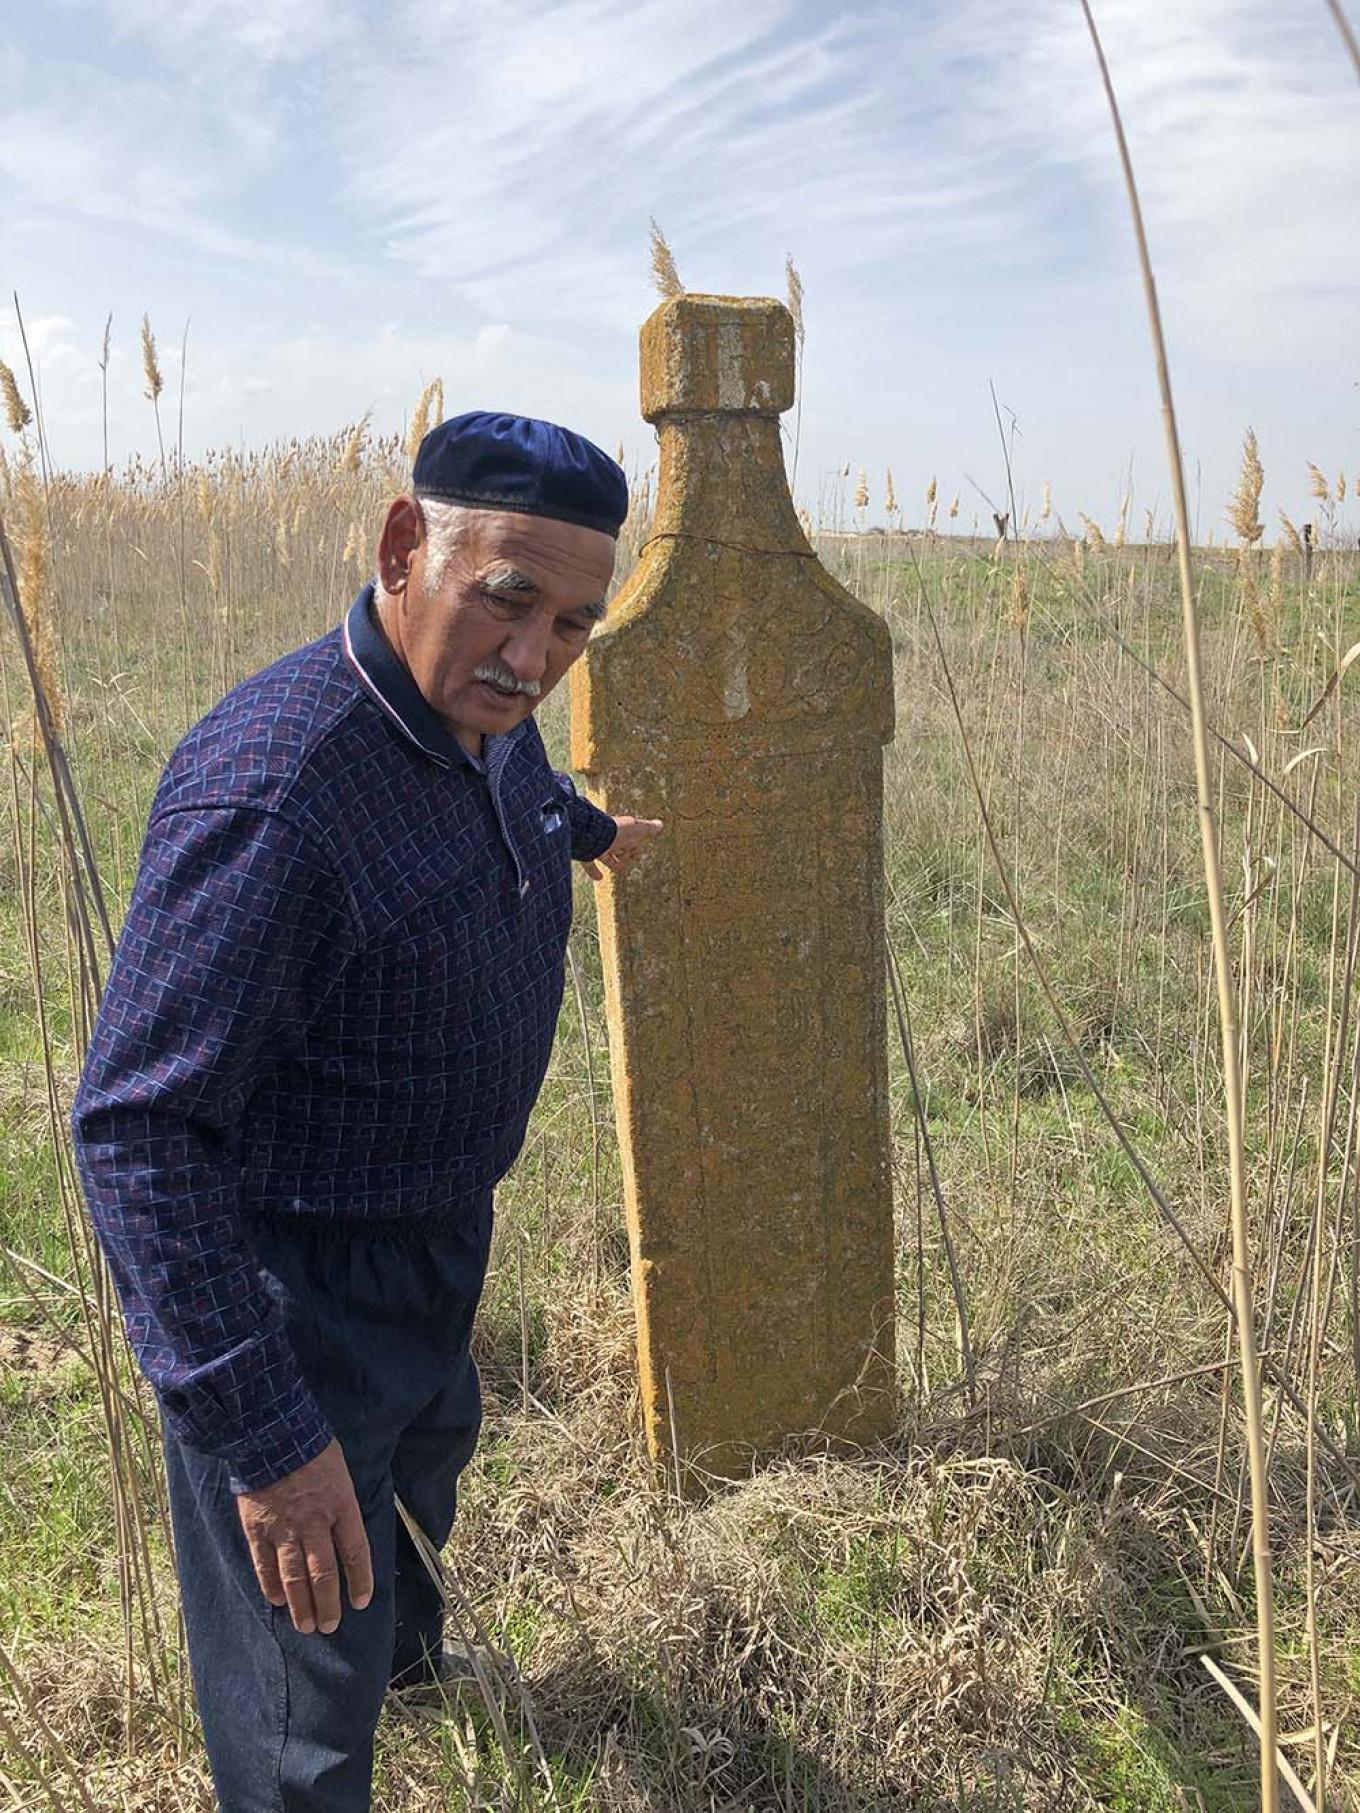 Di Kumli, mullah desa Shora Mamurov menyimpan catatan tentang kuburan yang hilang di bawah pasir. Felix Light / MT